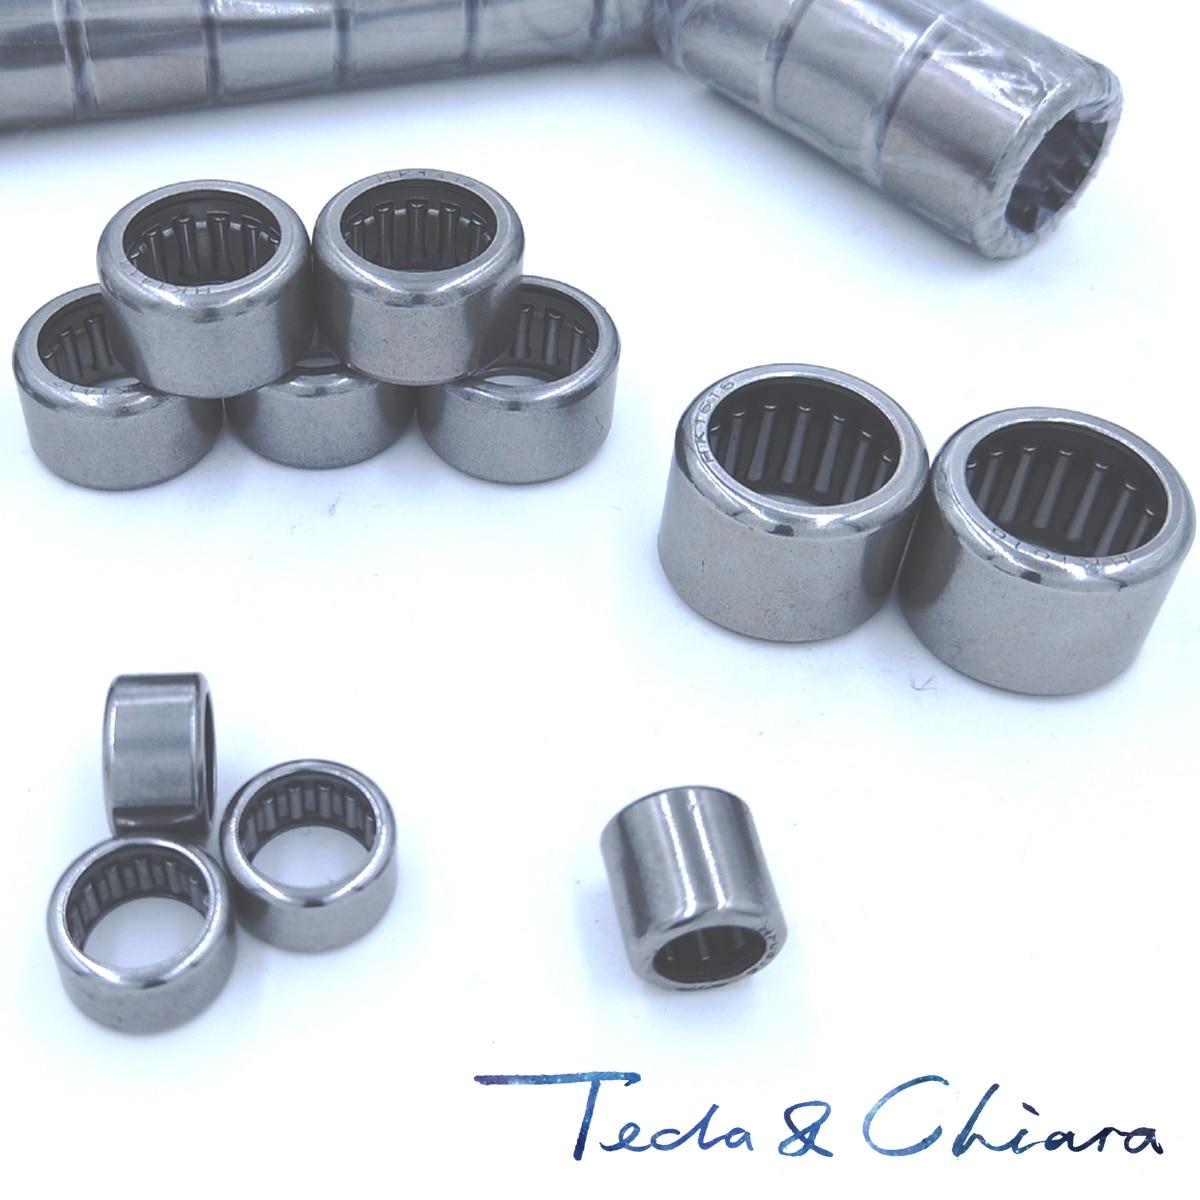 HK0609 HK061009 Needle Roller Bearing Bearings 6*10*9 10 PCS 6x10x9 mm